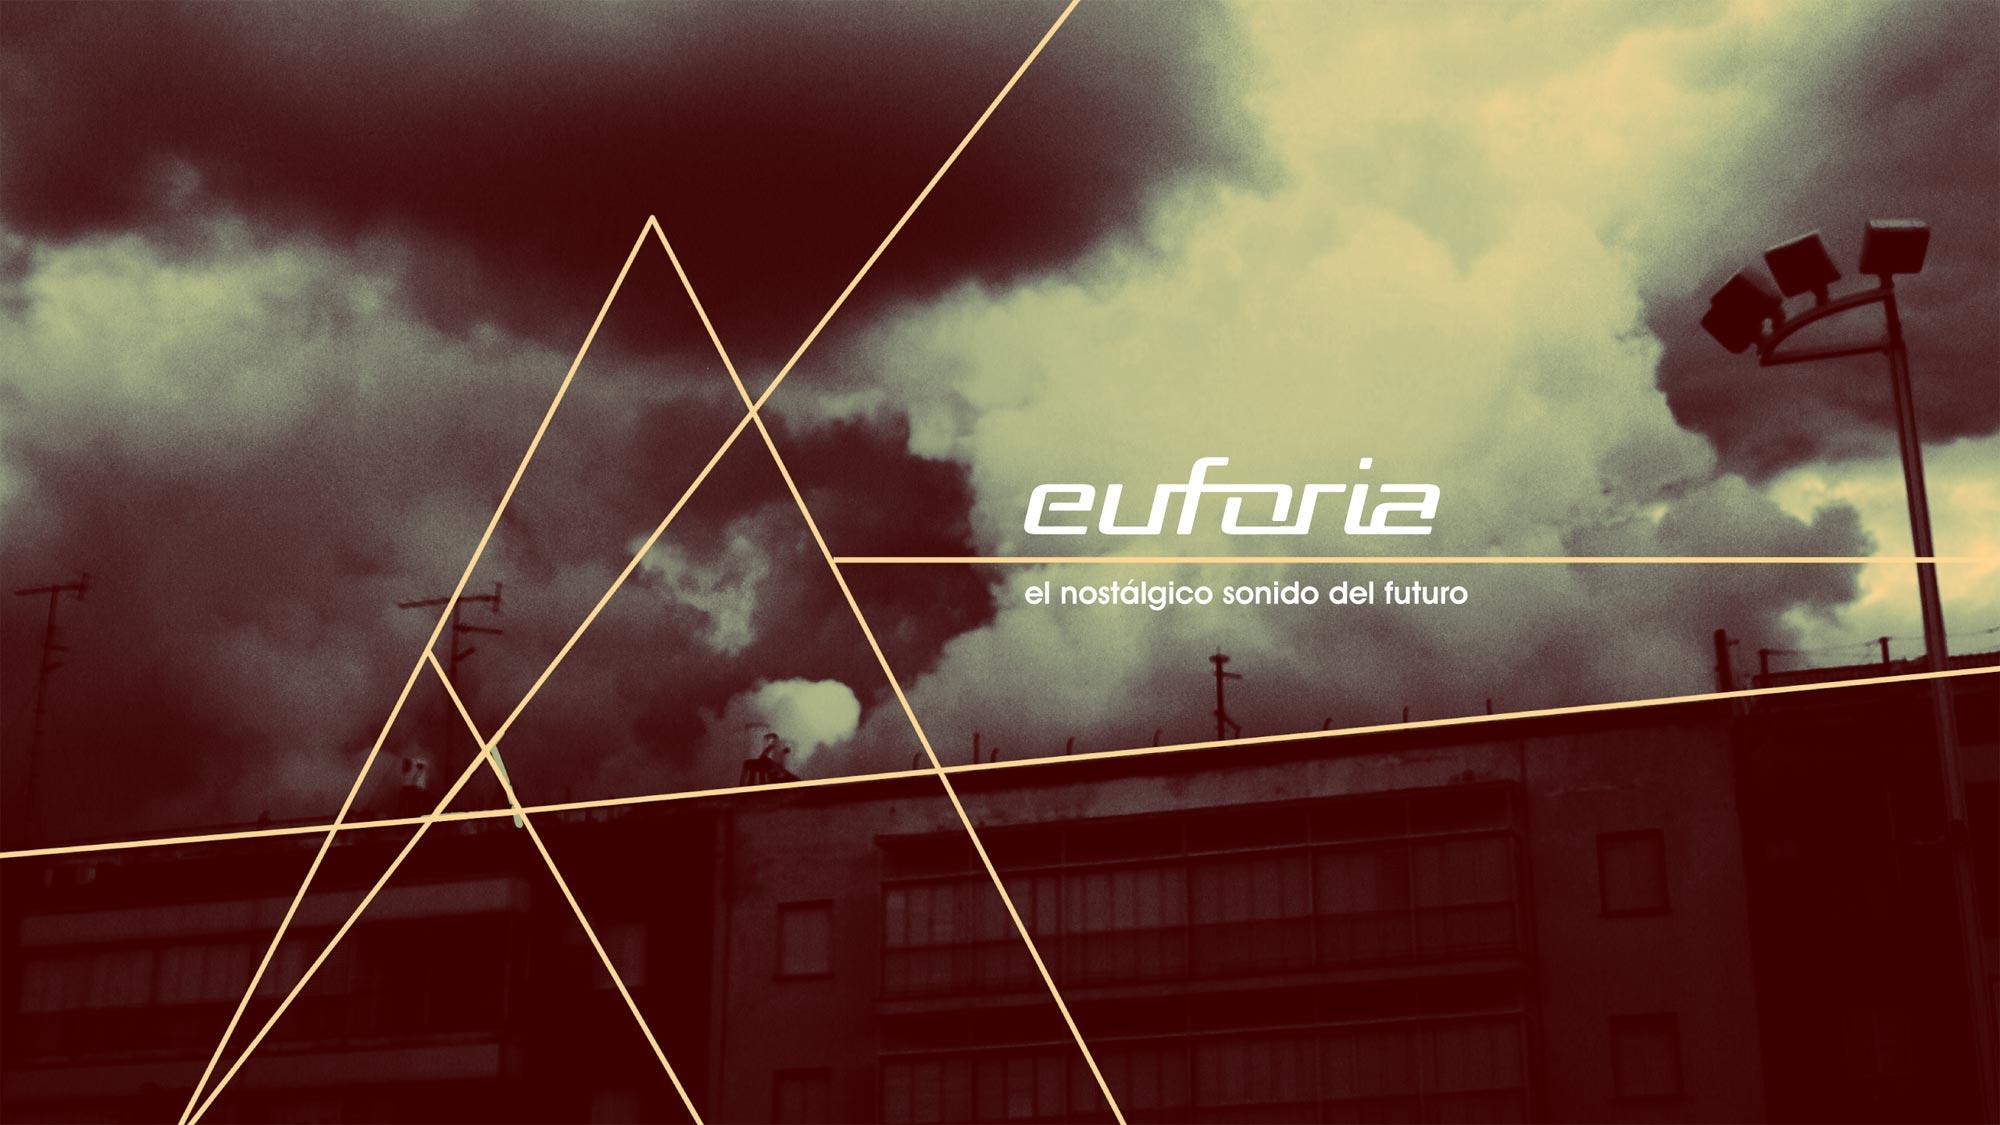 Euforia-about